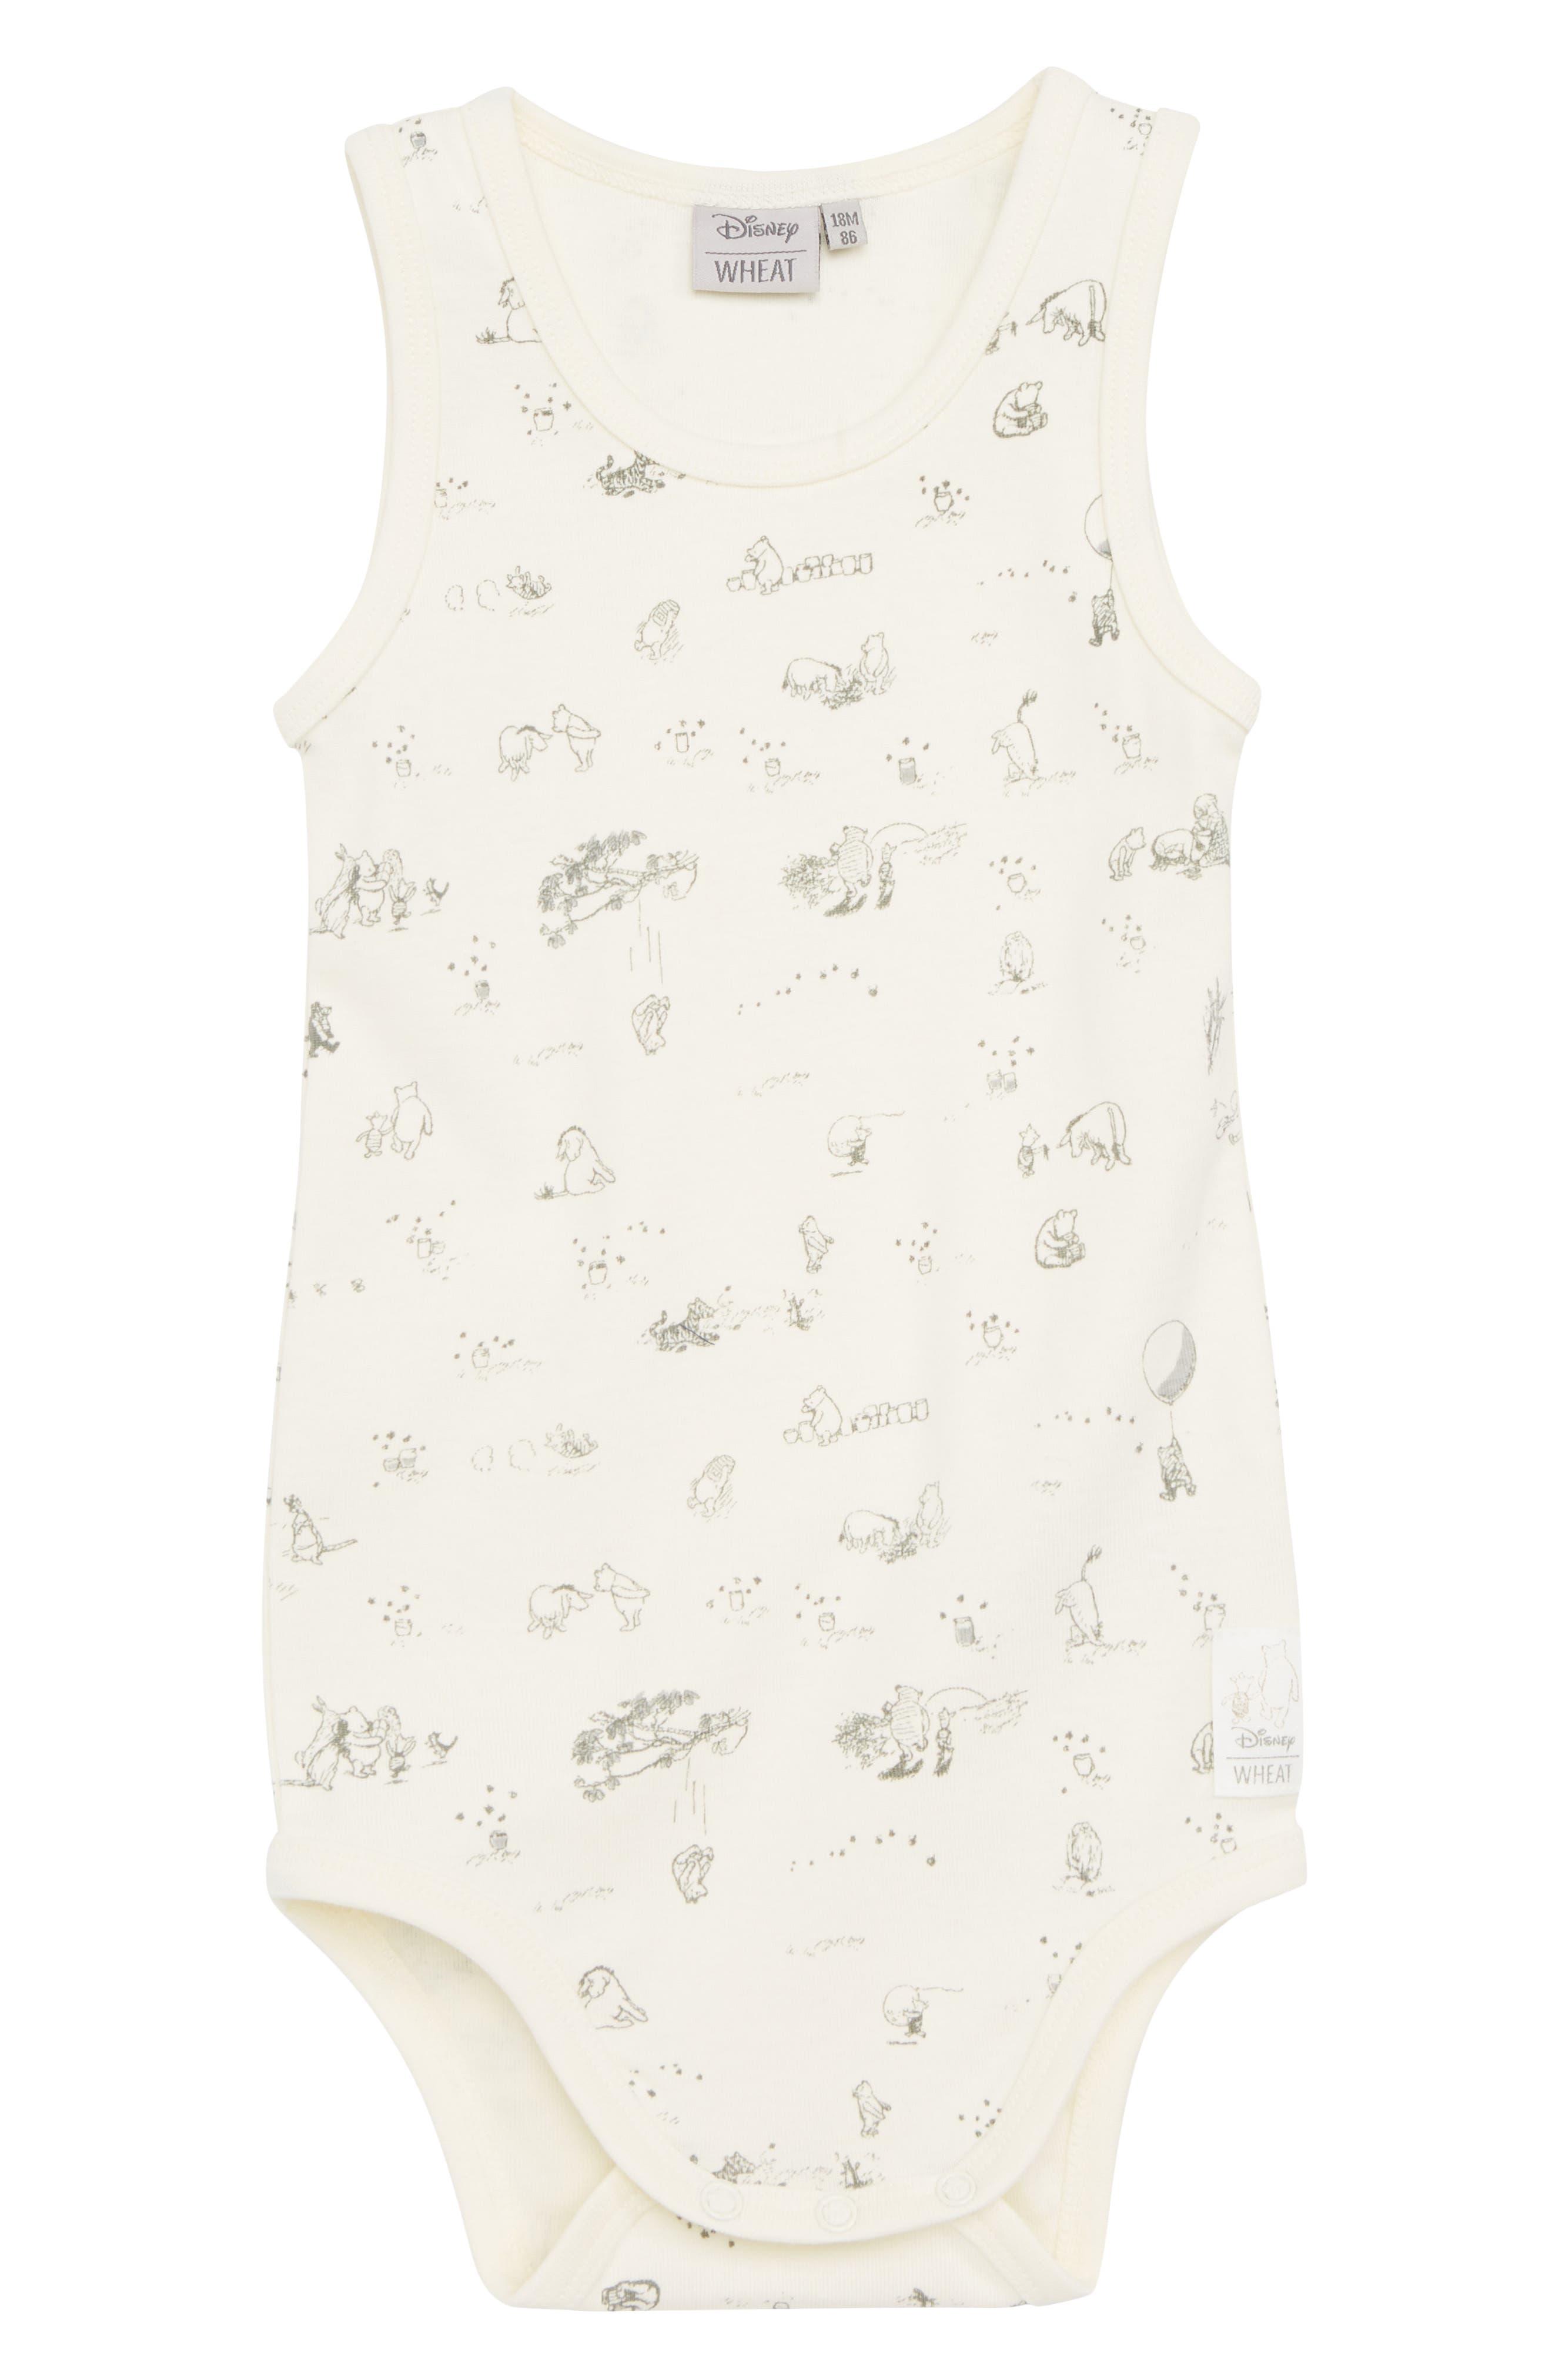 Wheat x Disney® Winnie the Pooh Organic Cotton Bodysuit (Baby & Toddler)